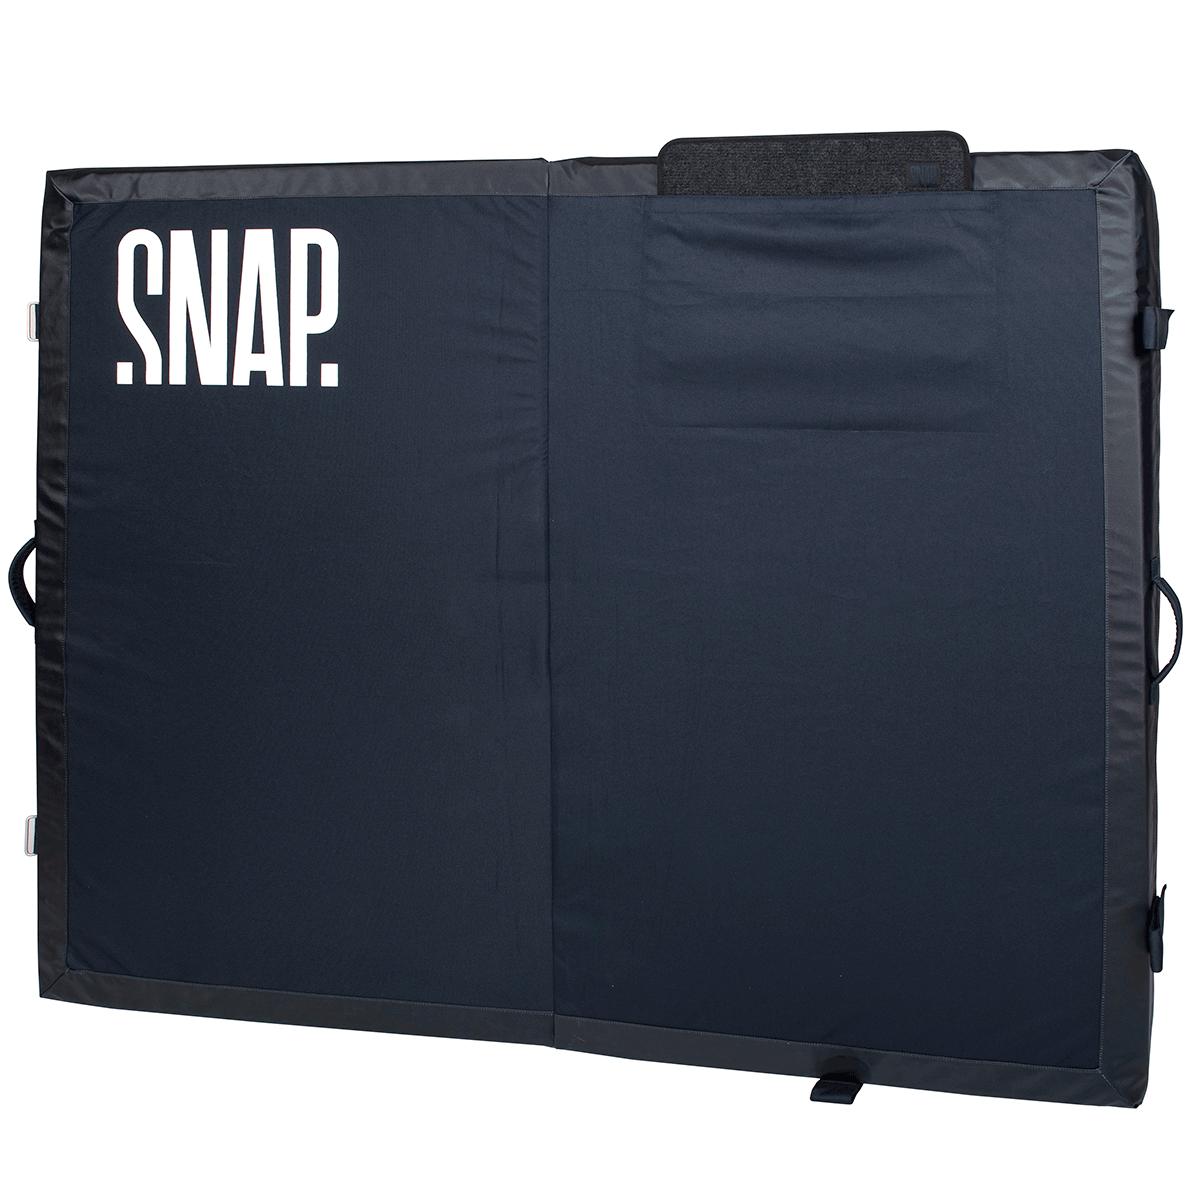 snap_crash_pad_grand_rebound_studio